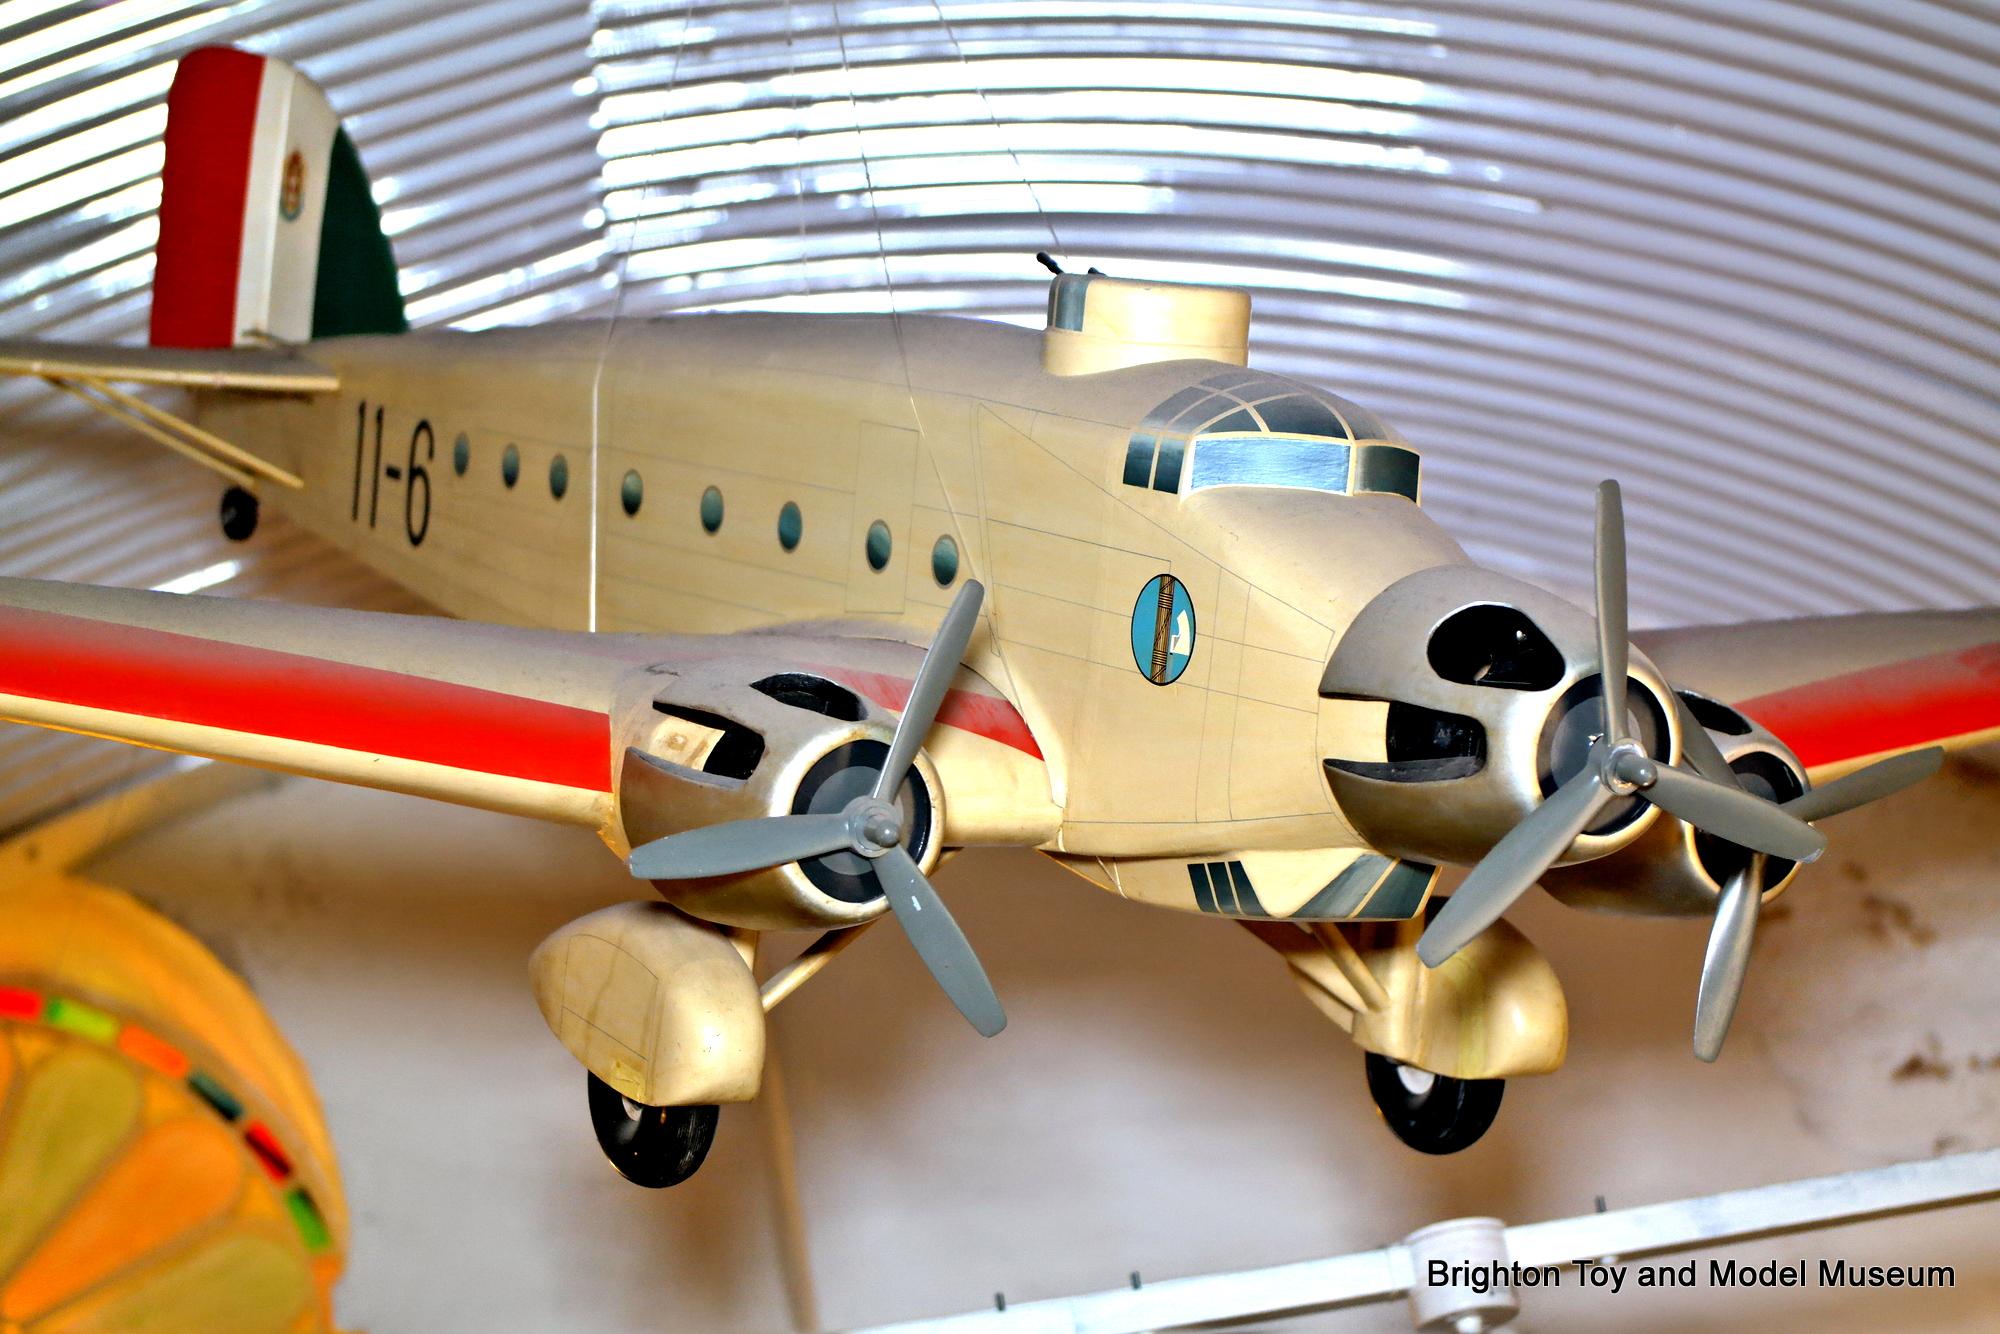 Savoia marchetti sm 79 gobba page 4 - Savoia Marchetti Sm81 Pipistrello Radio Controlled Trimotor Model Airplane Denis Hefford